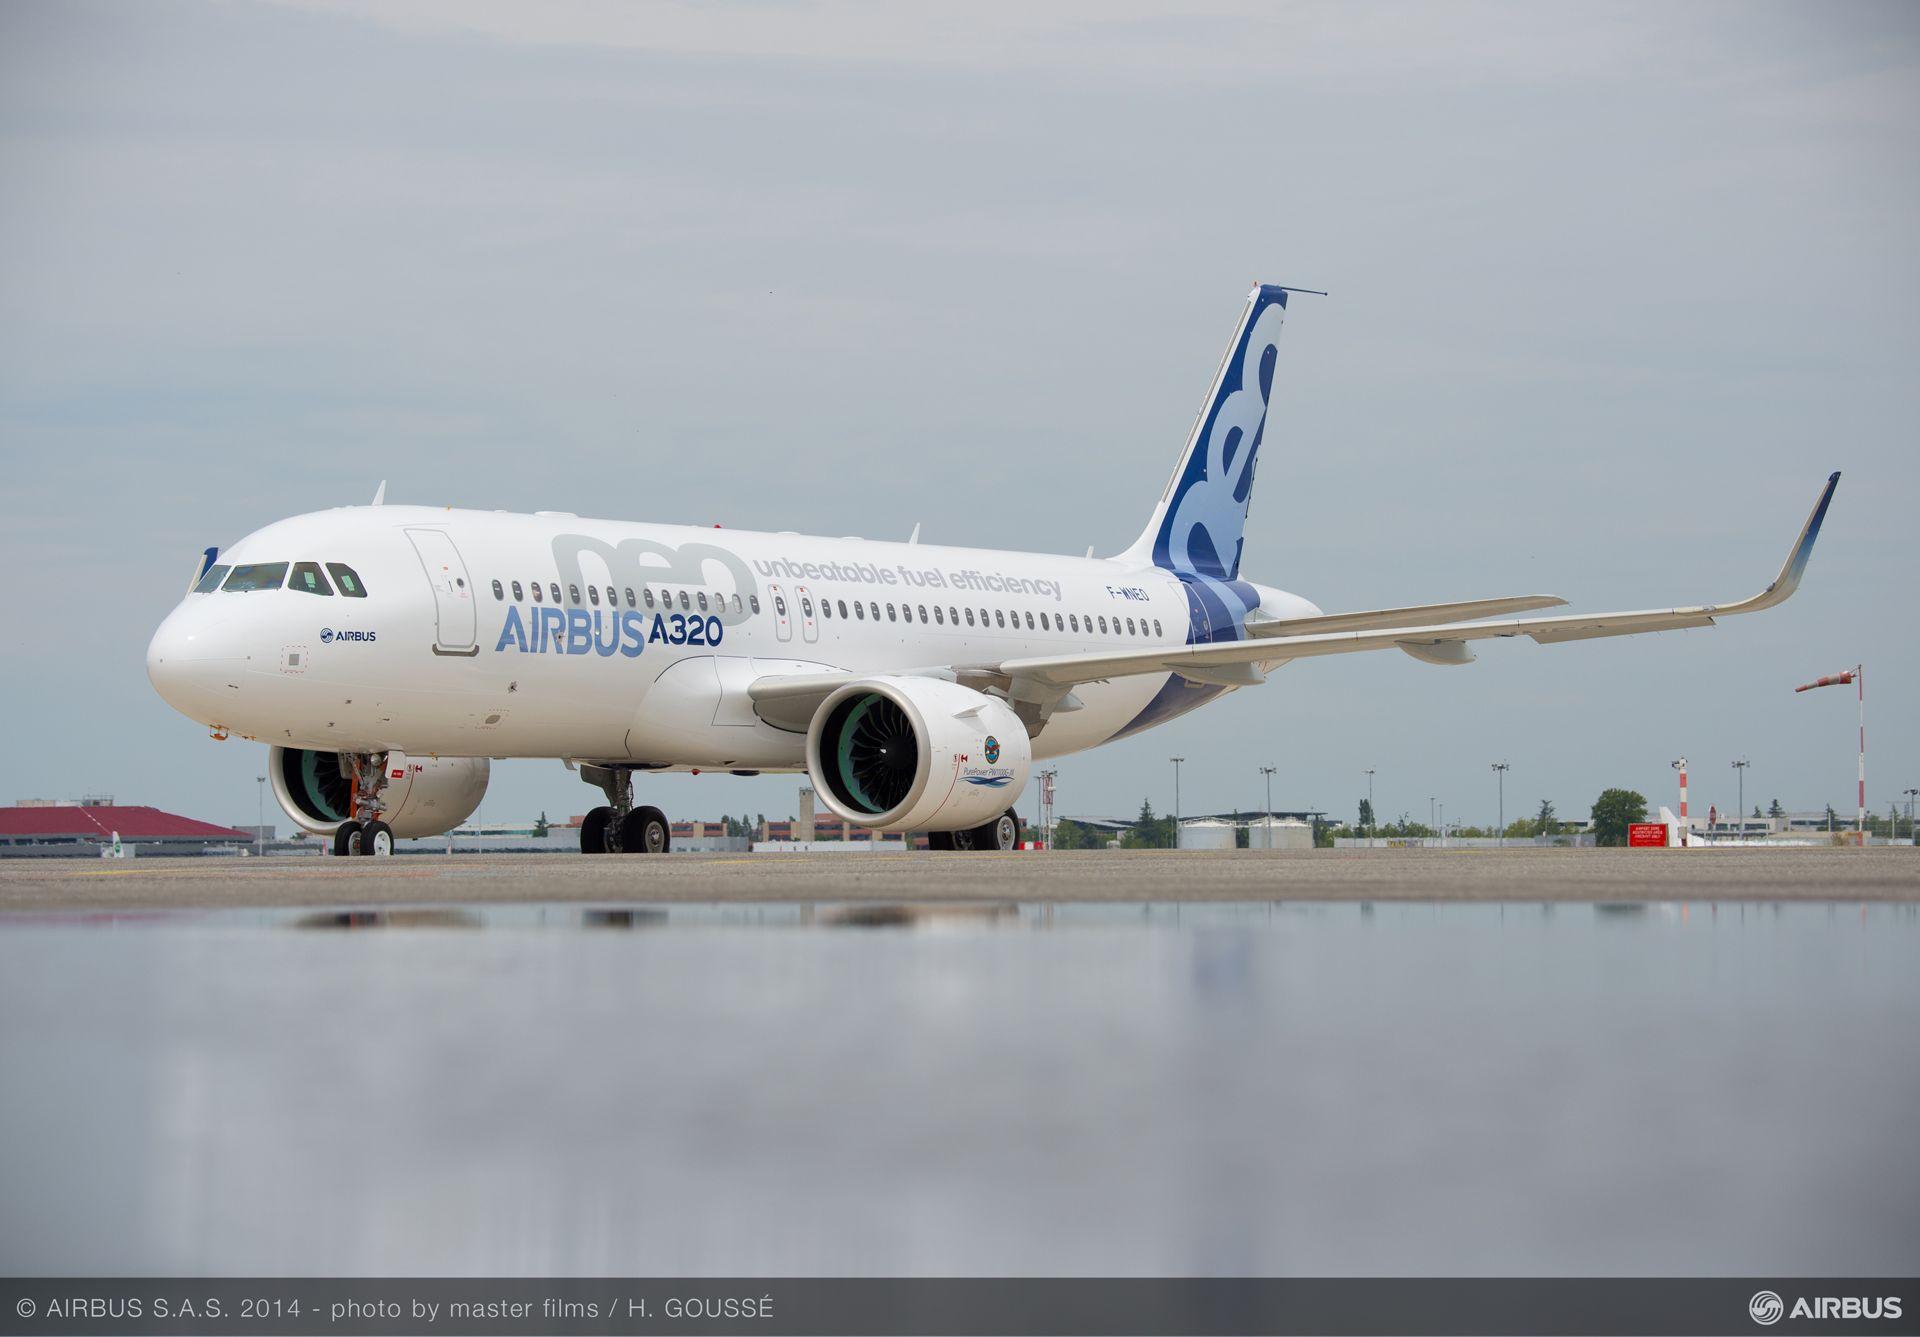 A320neo-Familie setzt mit 20 Prozent niedrigerem ...